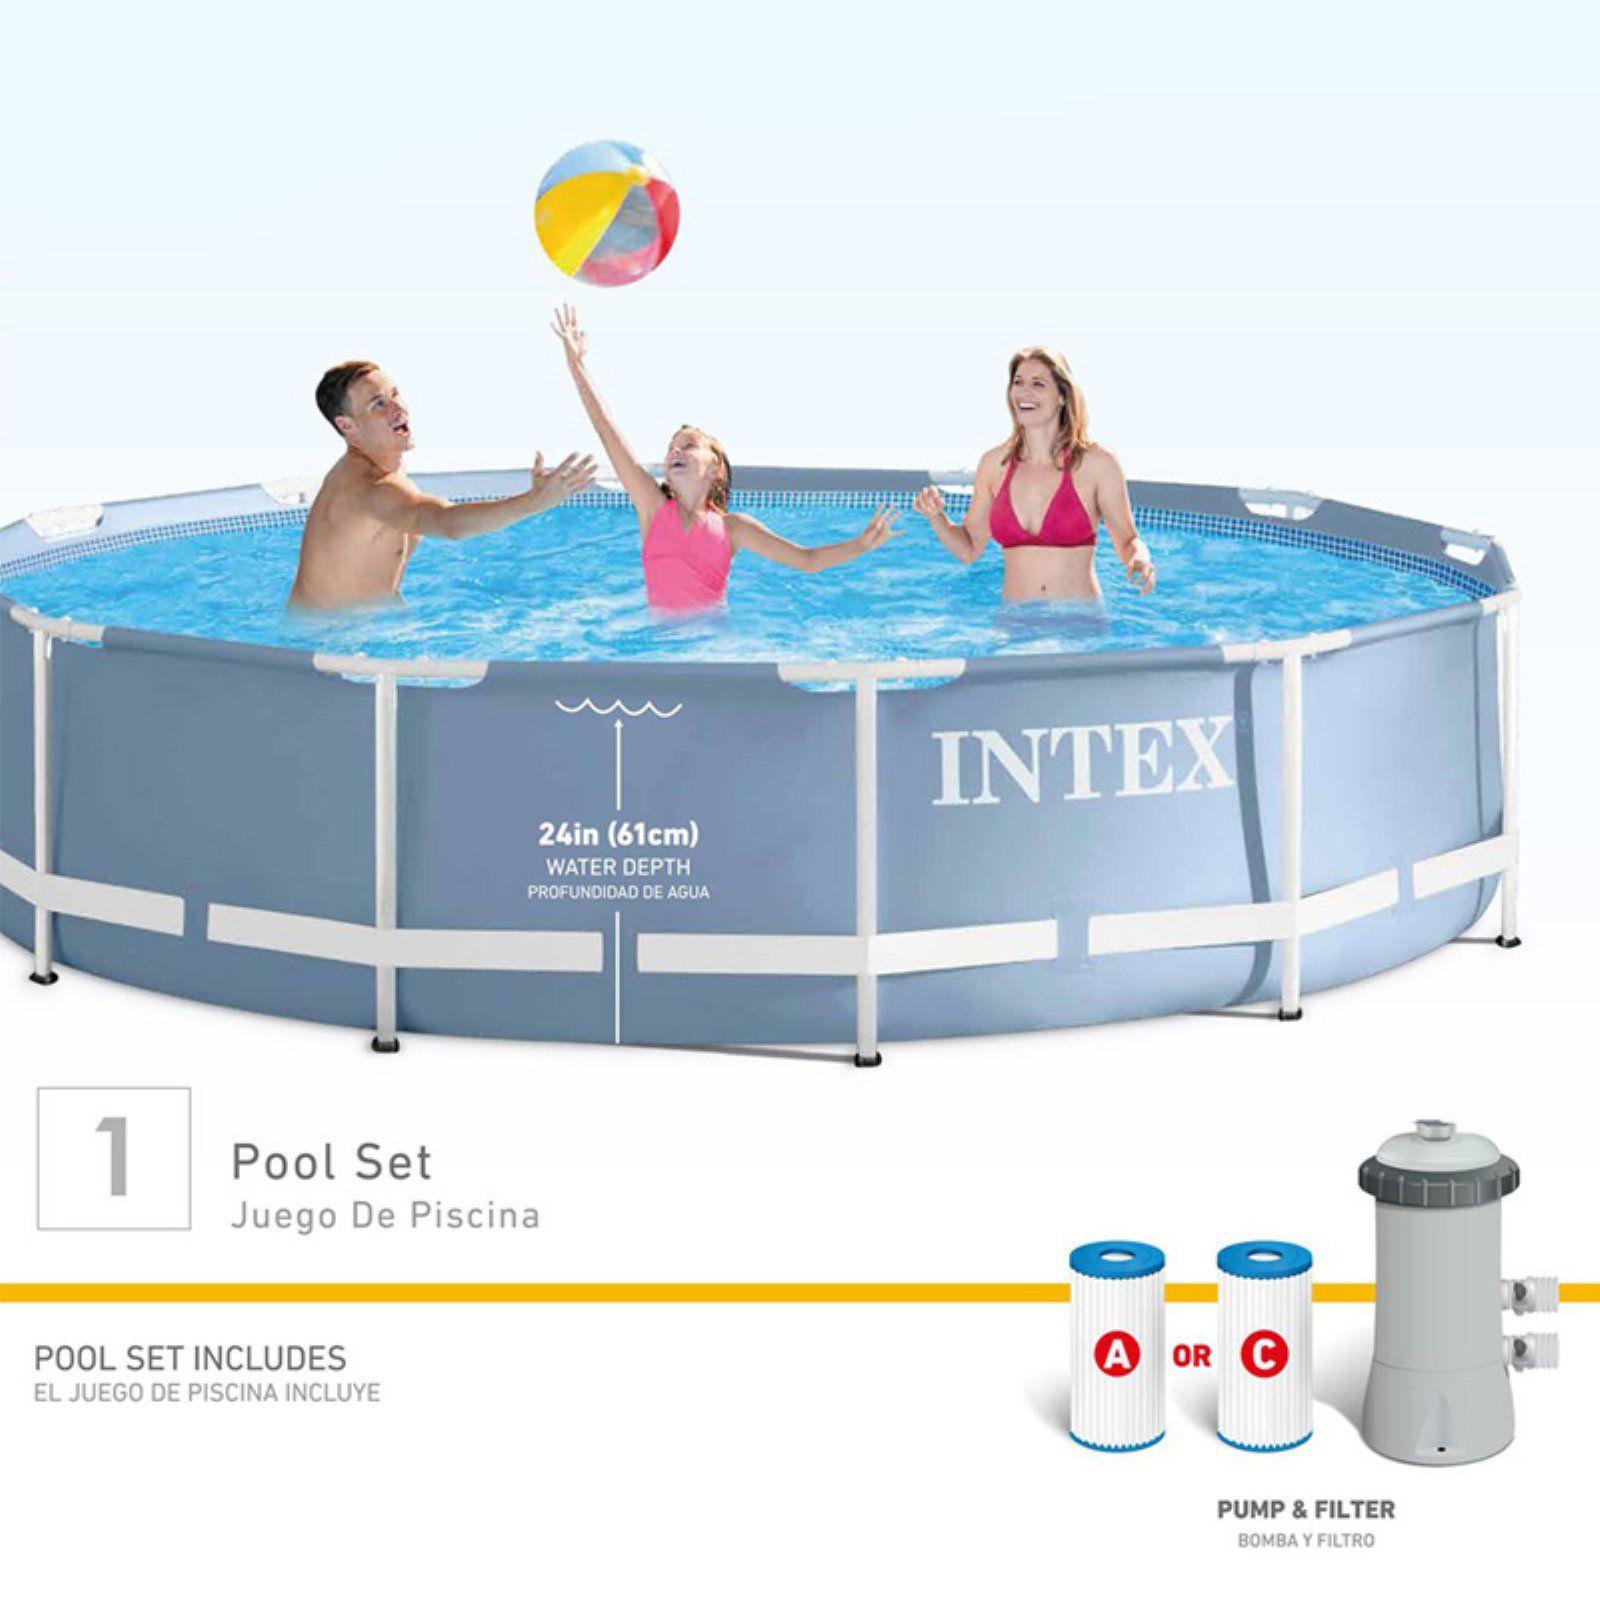 Pin By Lava Hot Deals On Lava Hot Deals Us Intex Pool Swimming